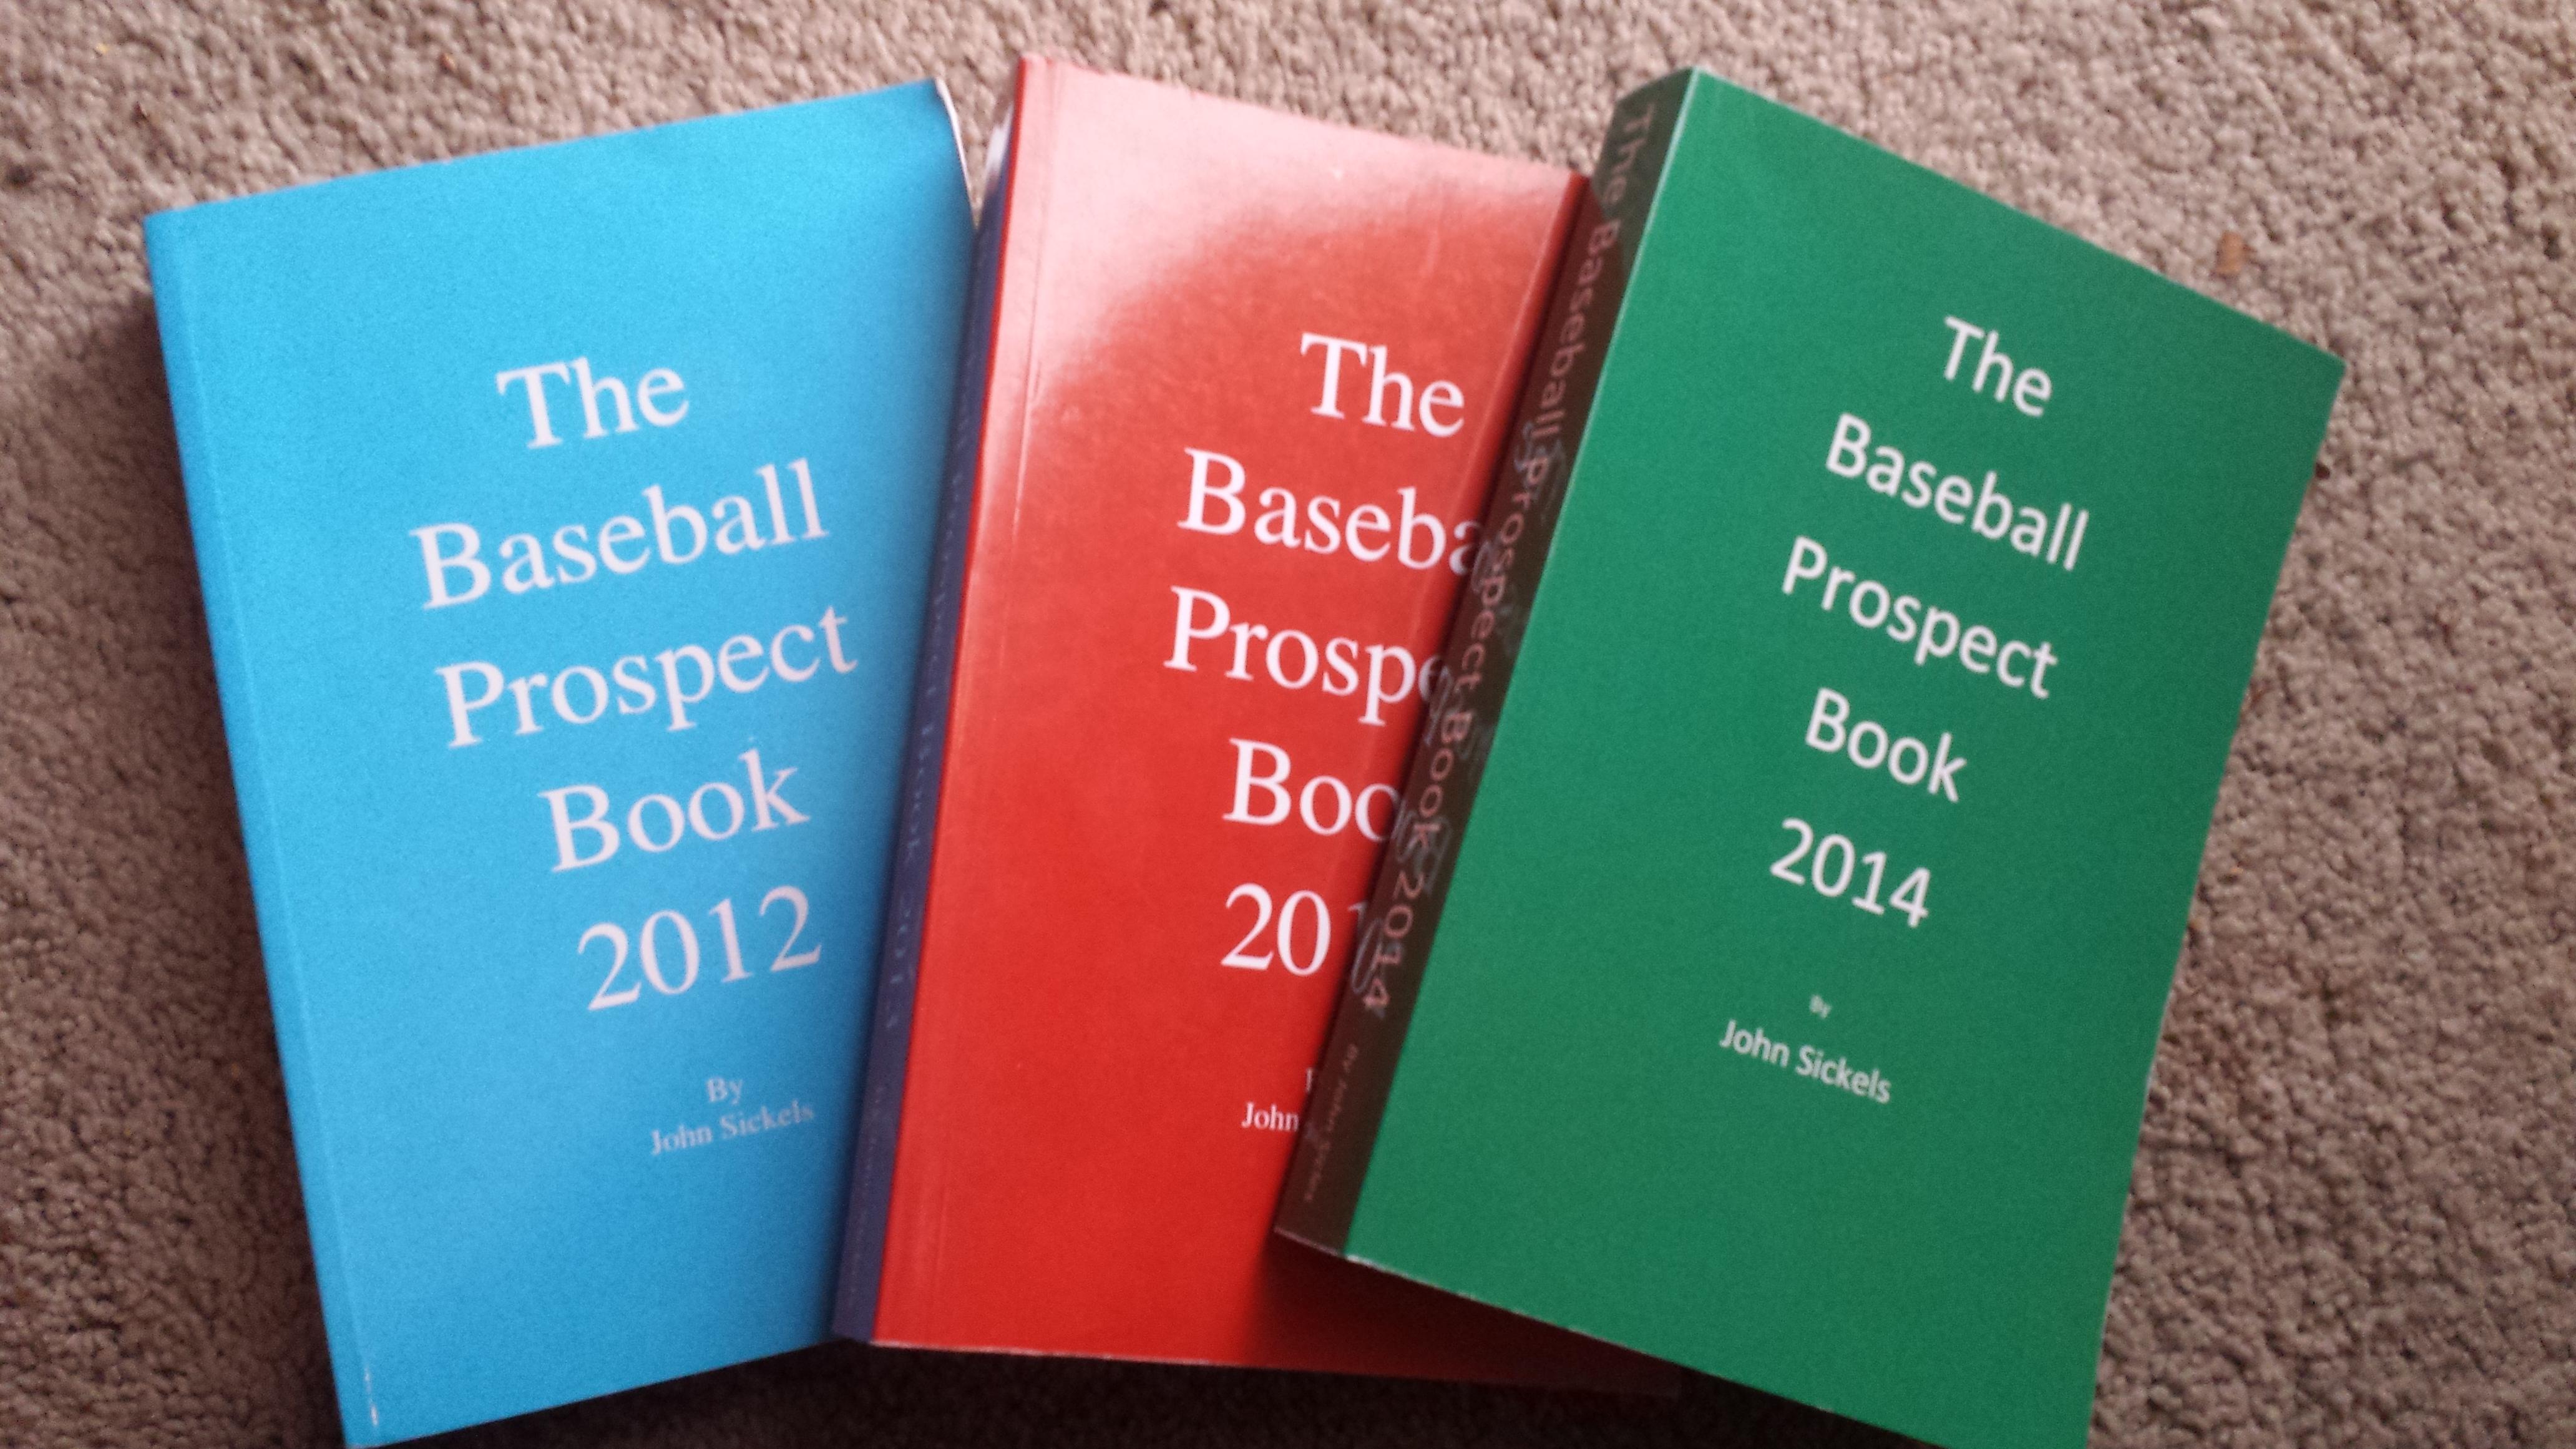 The Baseball Prospect Book